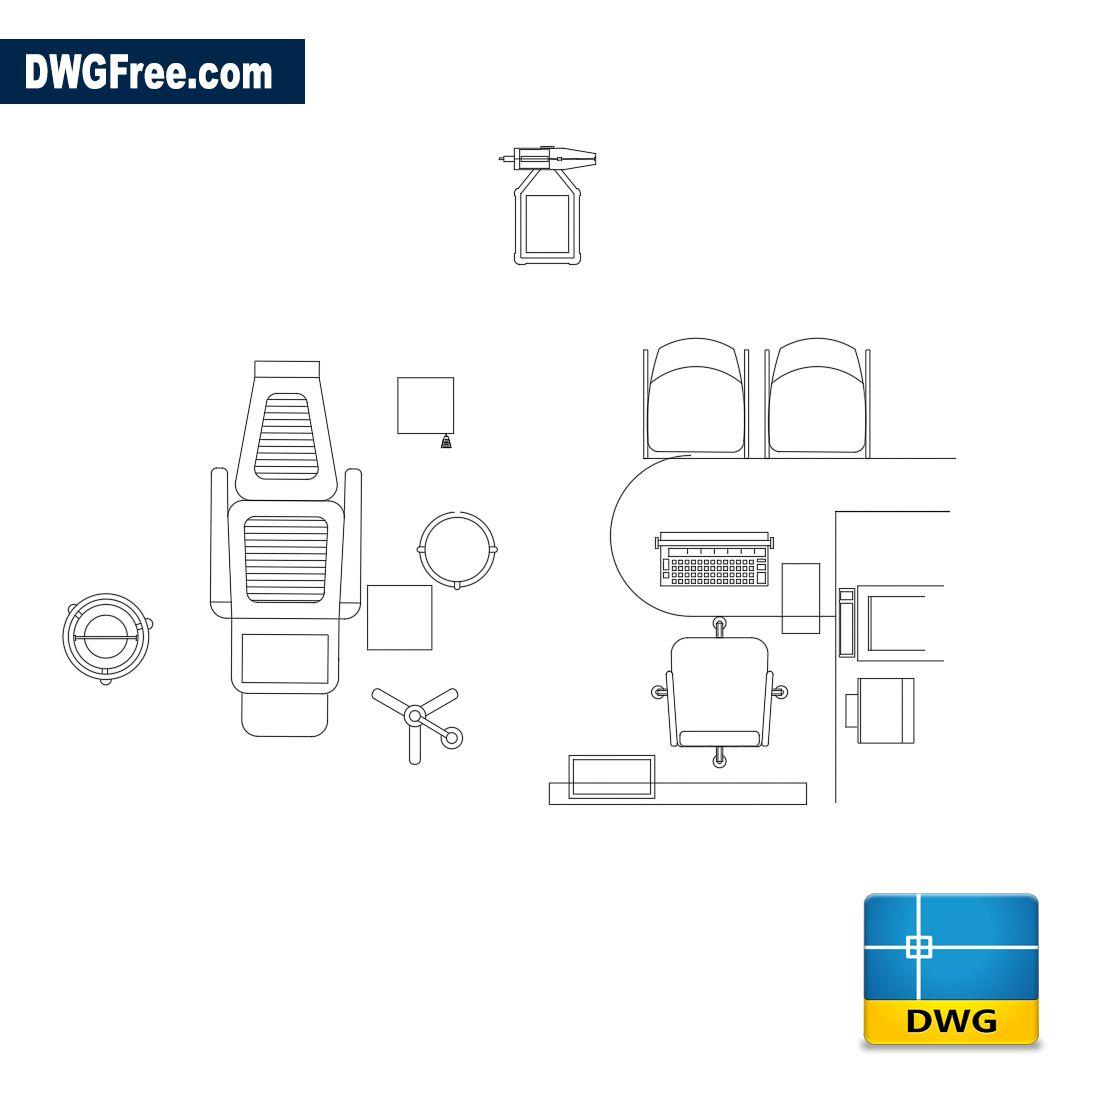 Dentist Room Furniture Dwg Download Autocad Blocks Model Room Furniture Furniture Room